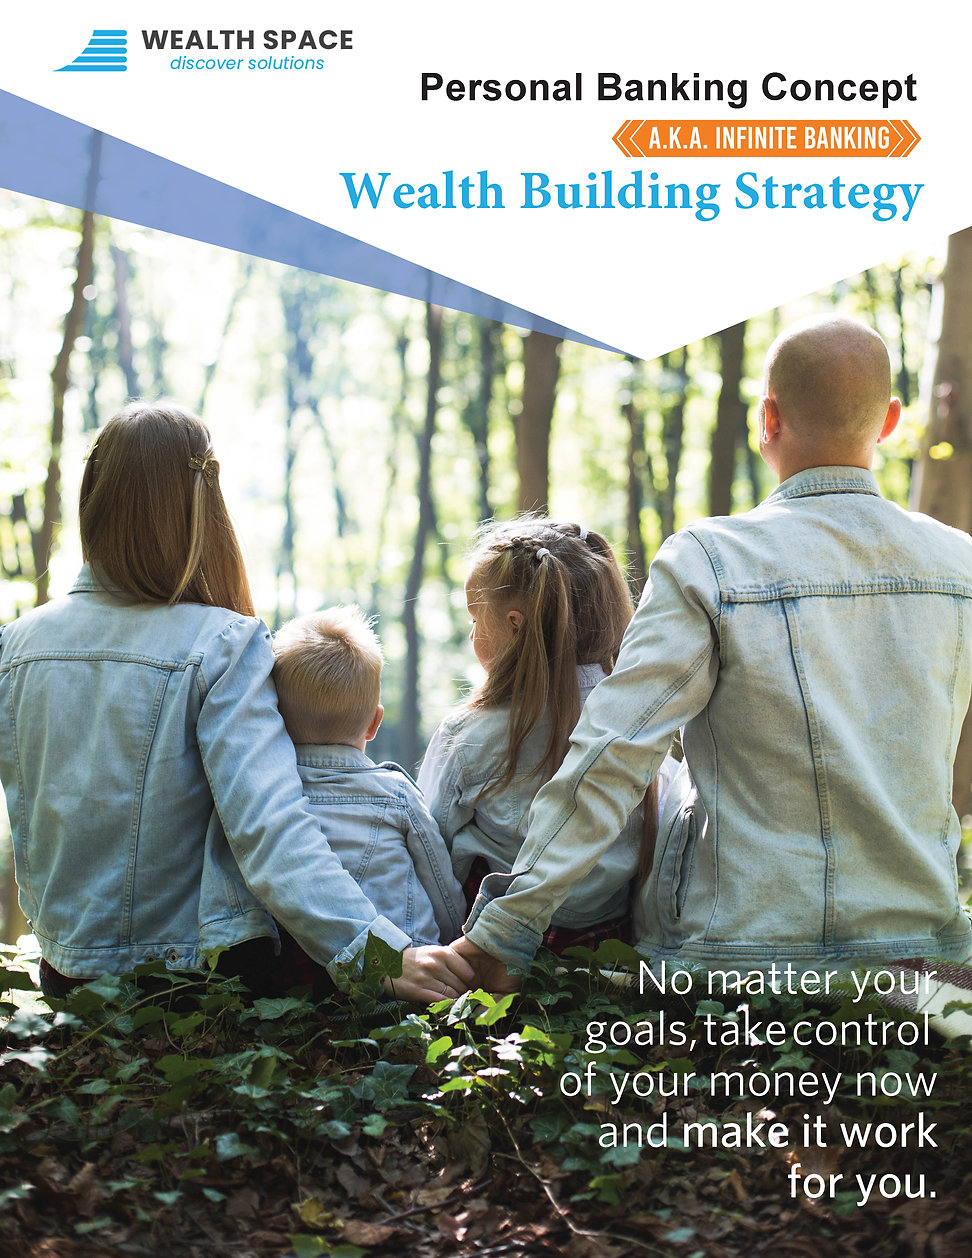 PBC - Wealth Building Strategy 1-1.jpg